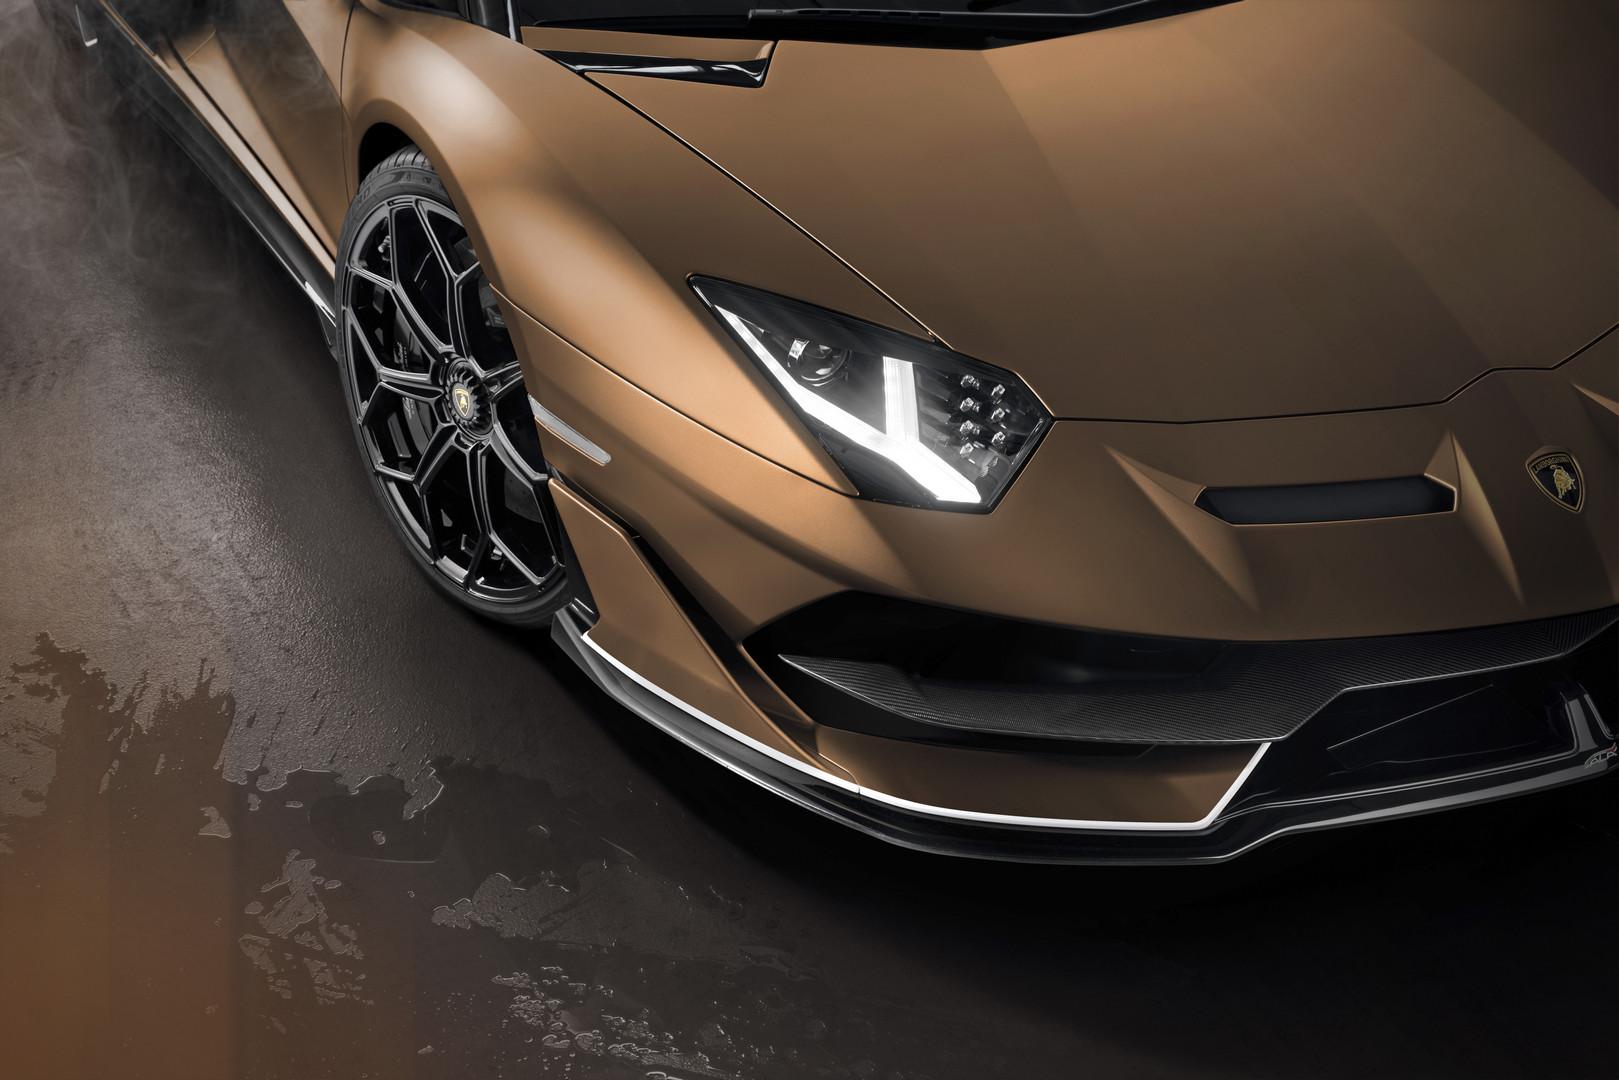 Lamborghini Aventador Svj Roadster Revealed 800 Units Only Gtspirit